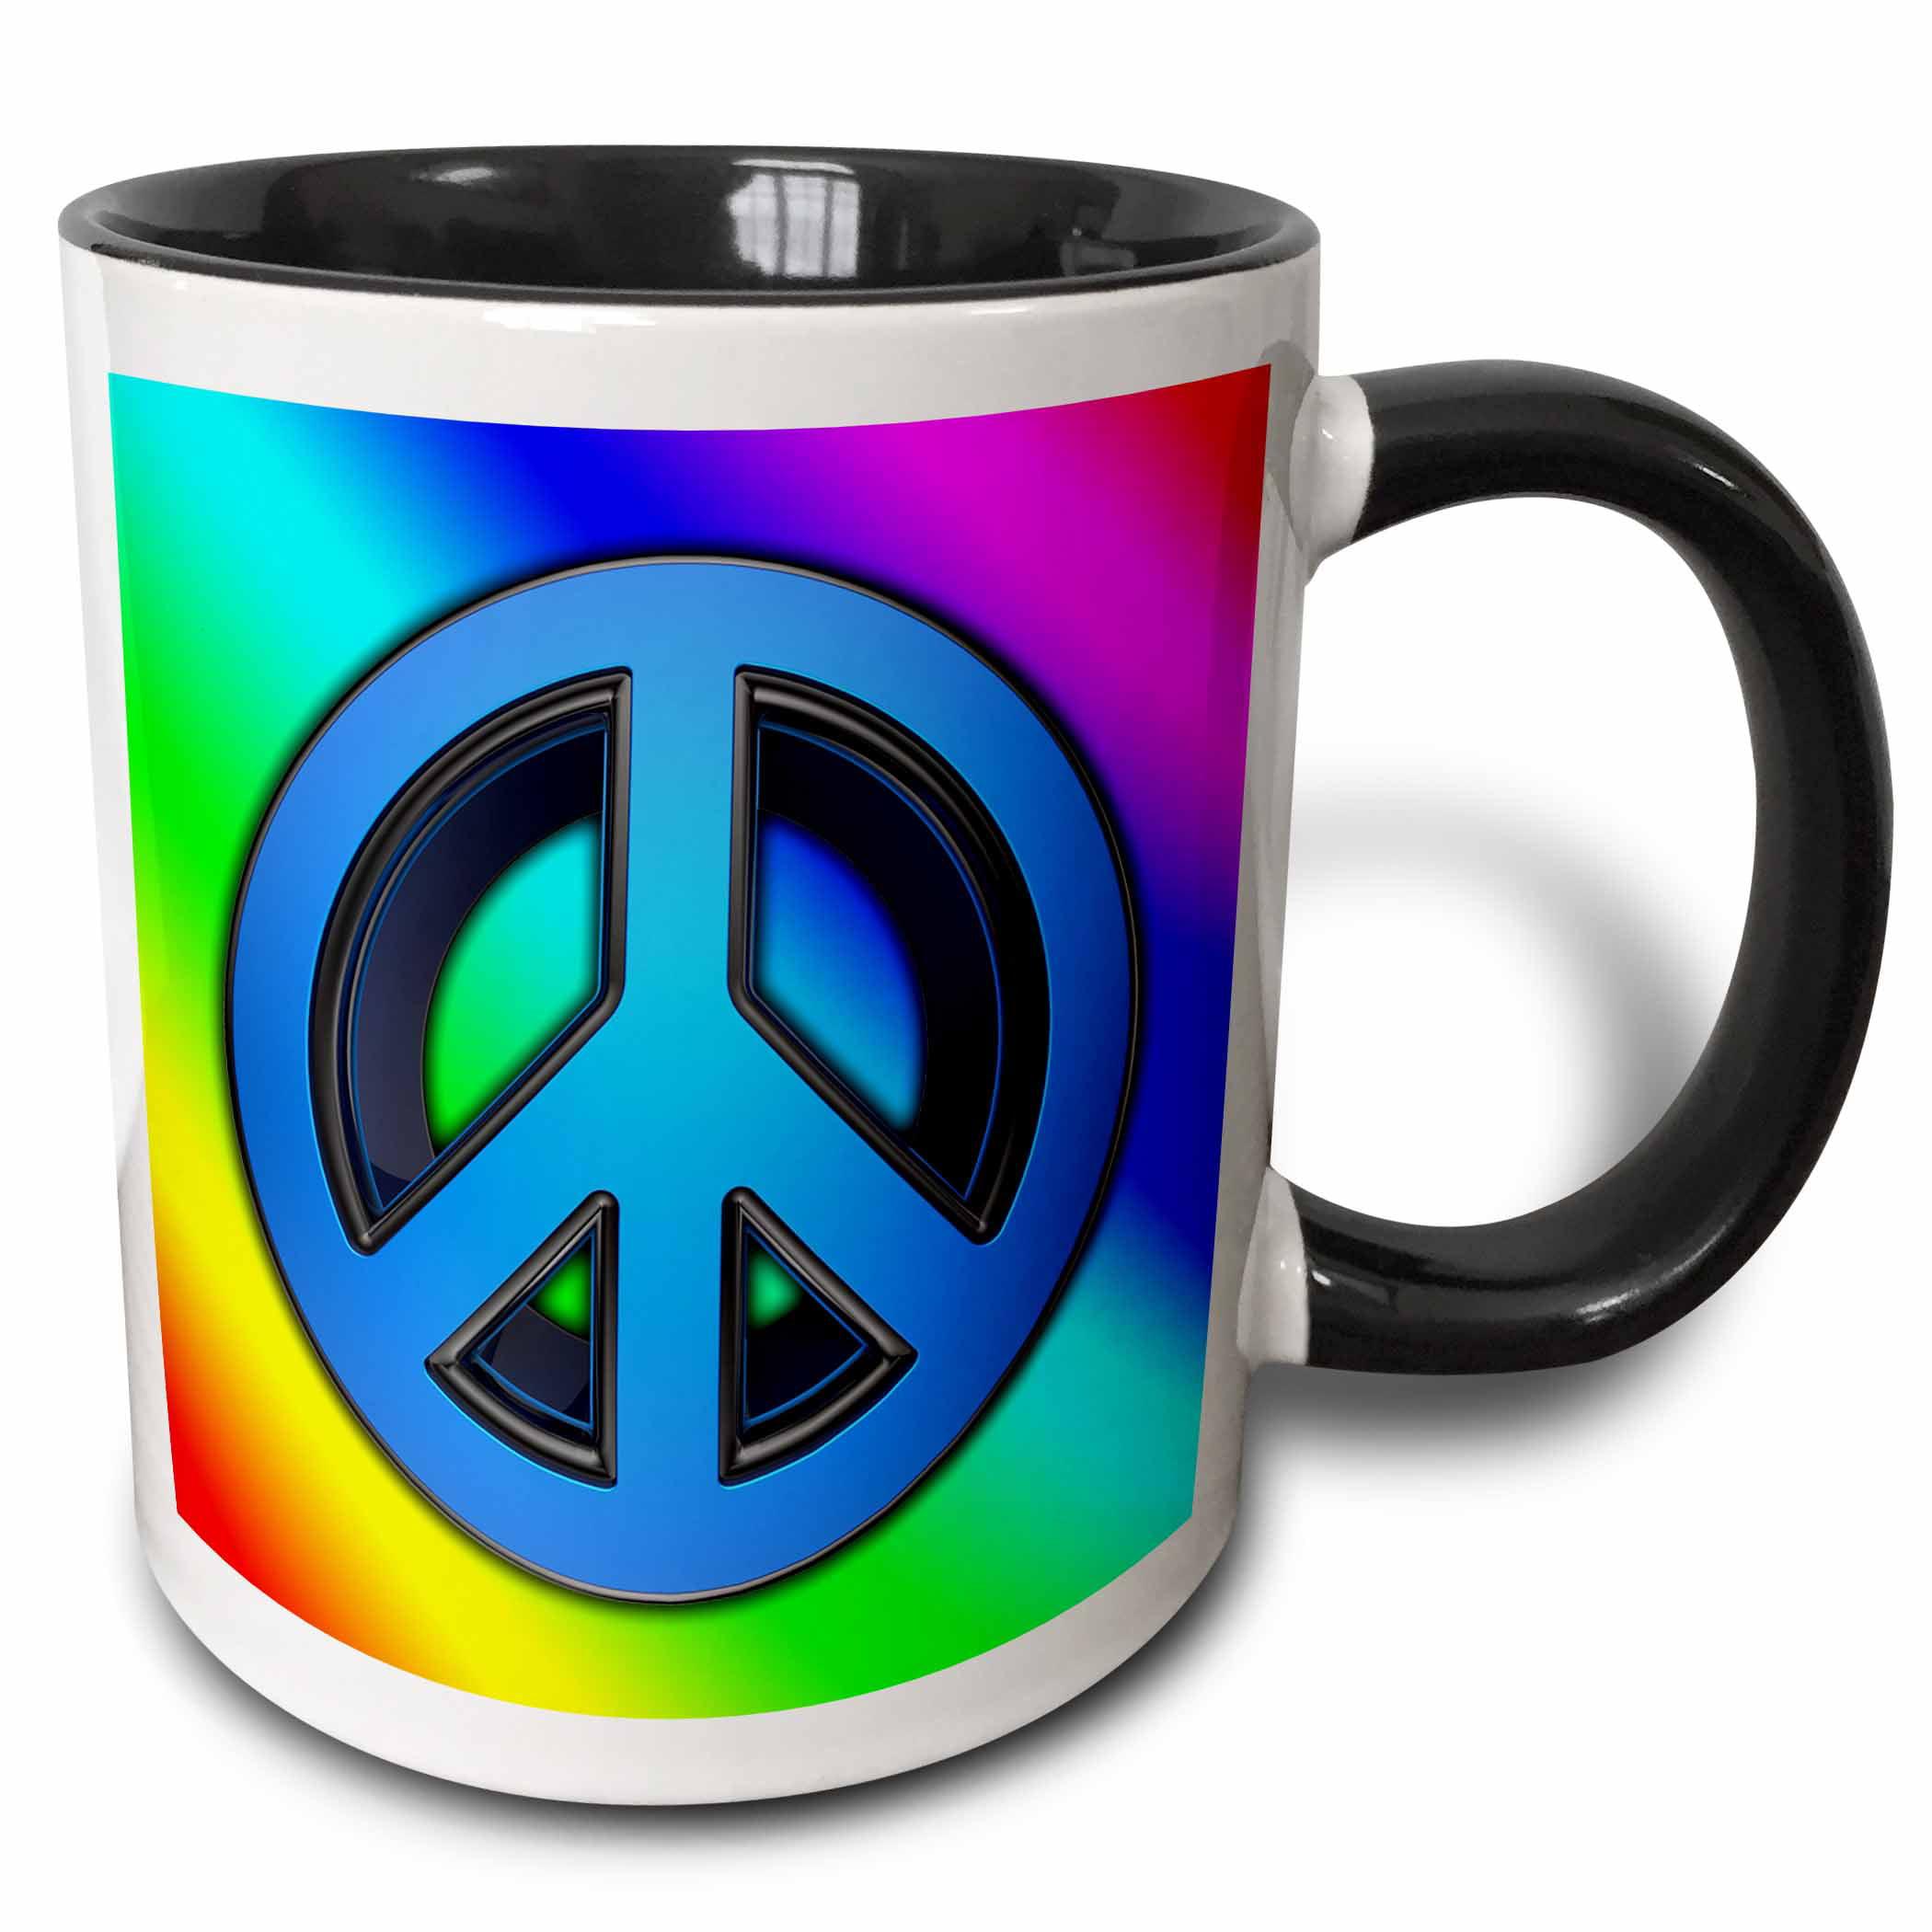 3drose Peace Sign Over Rainbow Background Love Two Tone Black Mug 15 Ounce Walmart Com Walmart Com